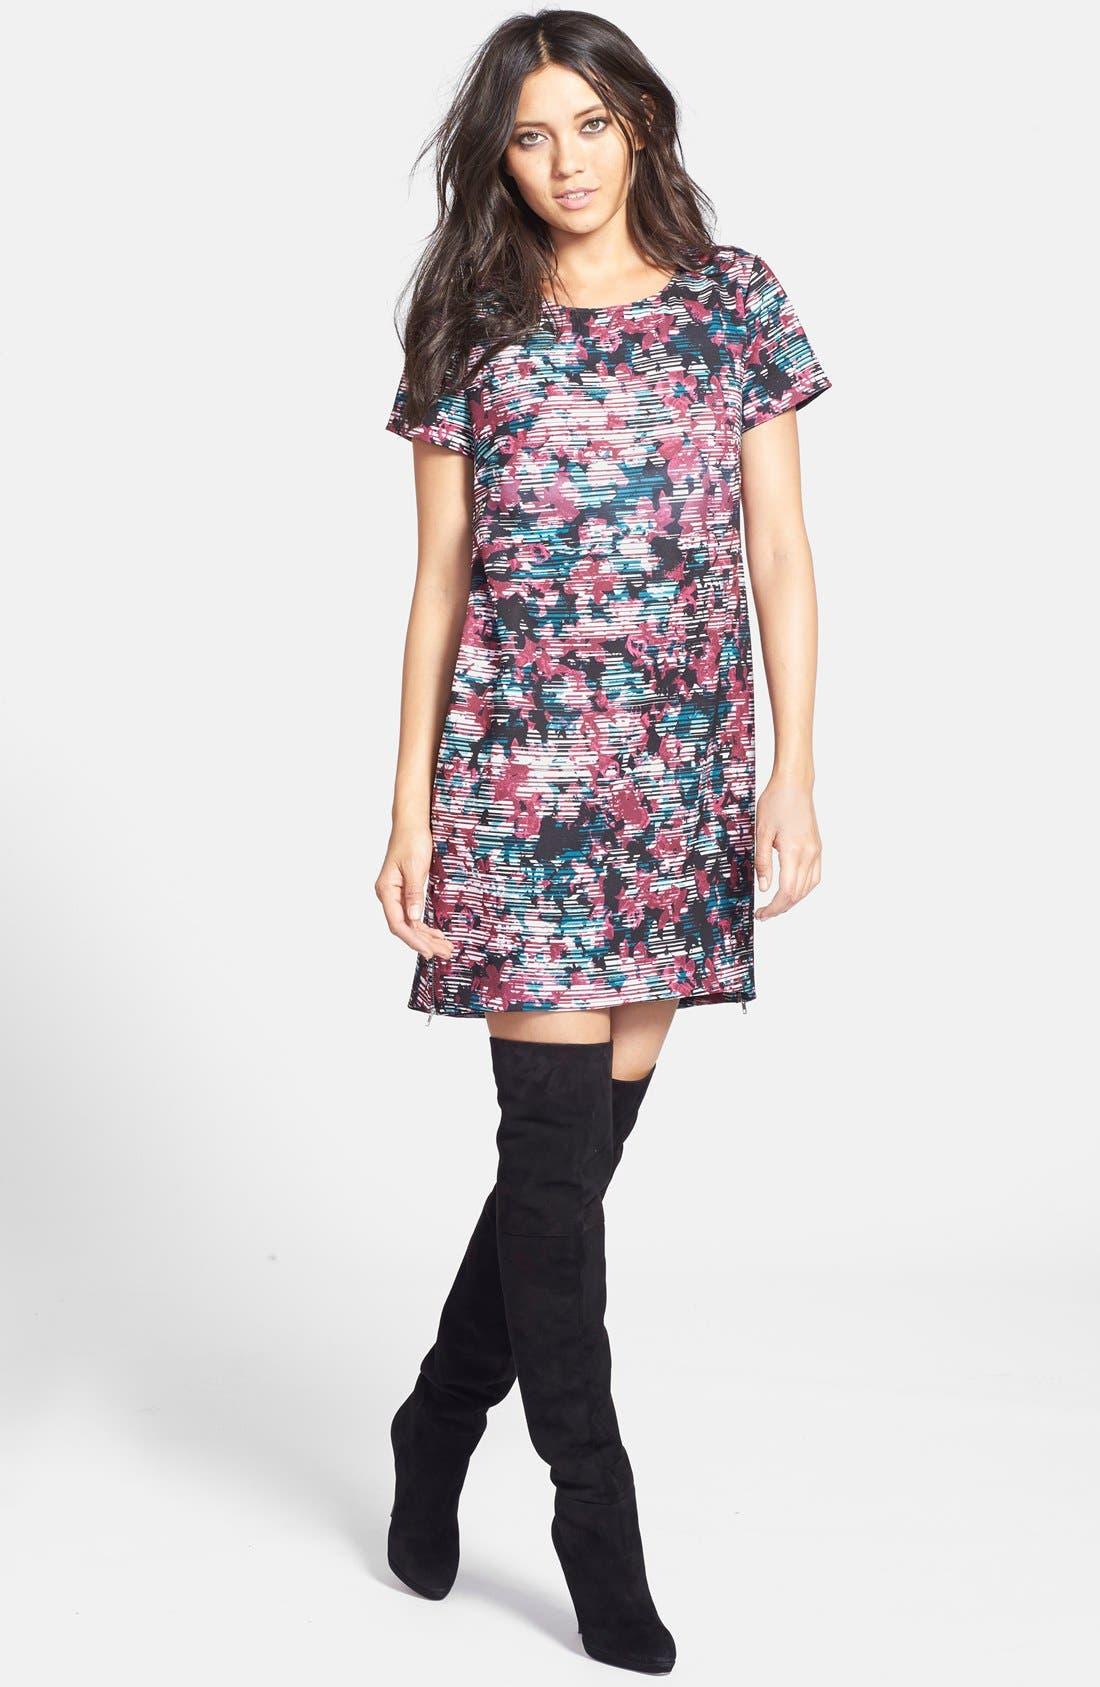 Alternate Image 1 Selected - Wayf Crepe Print Shift Dress